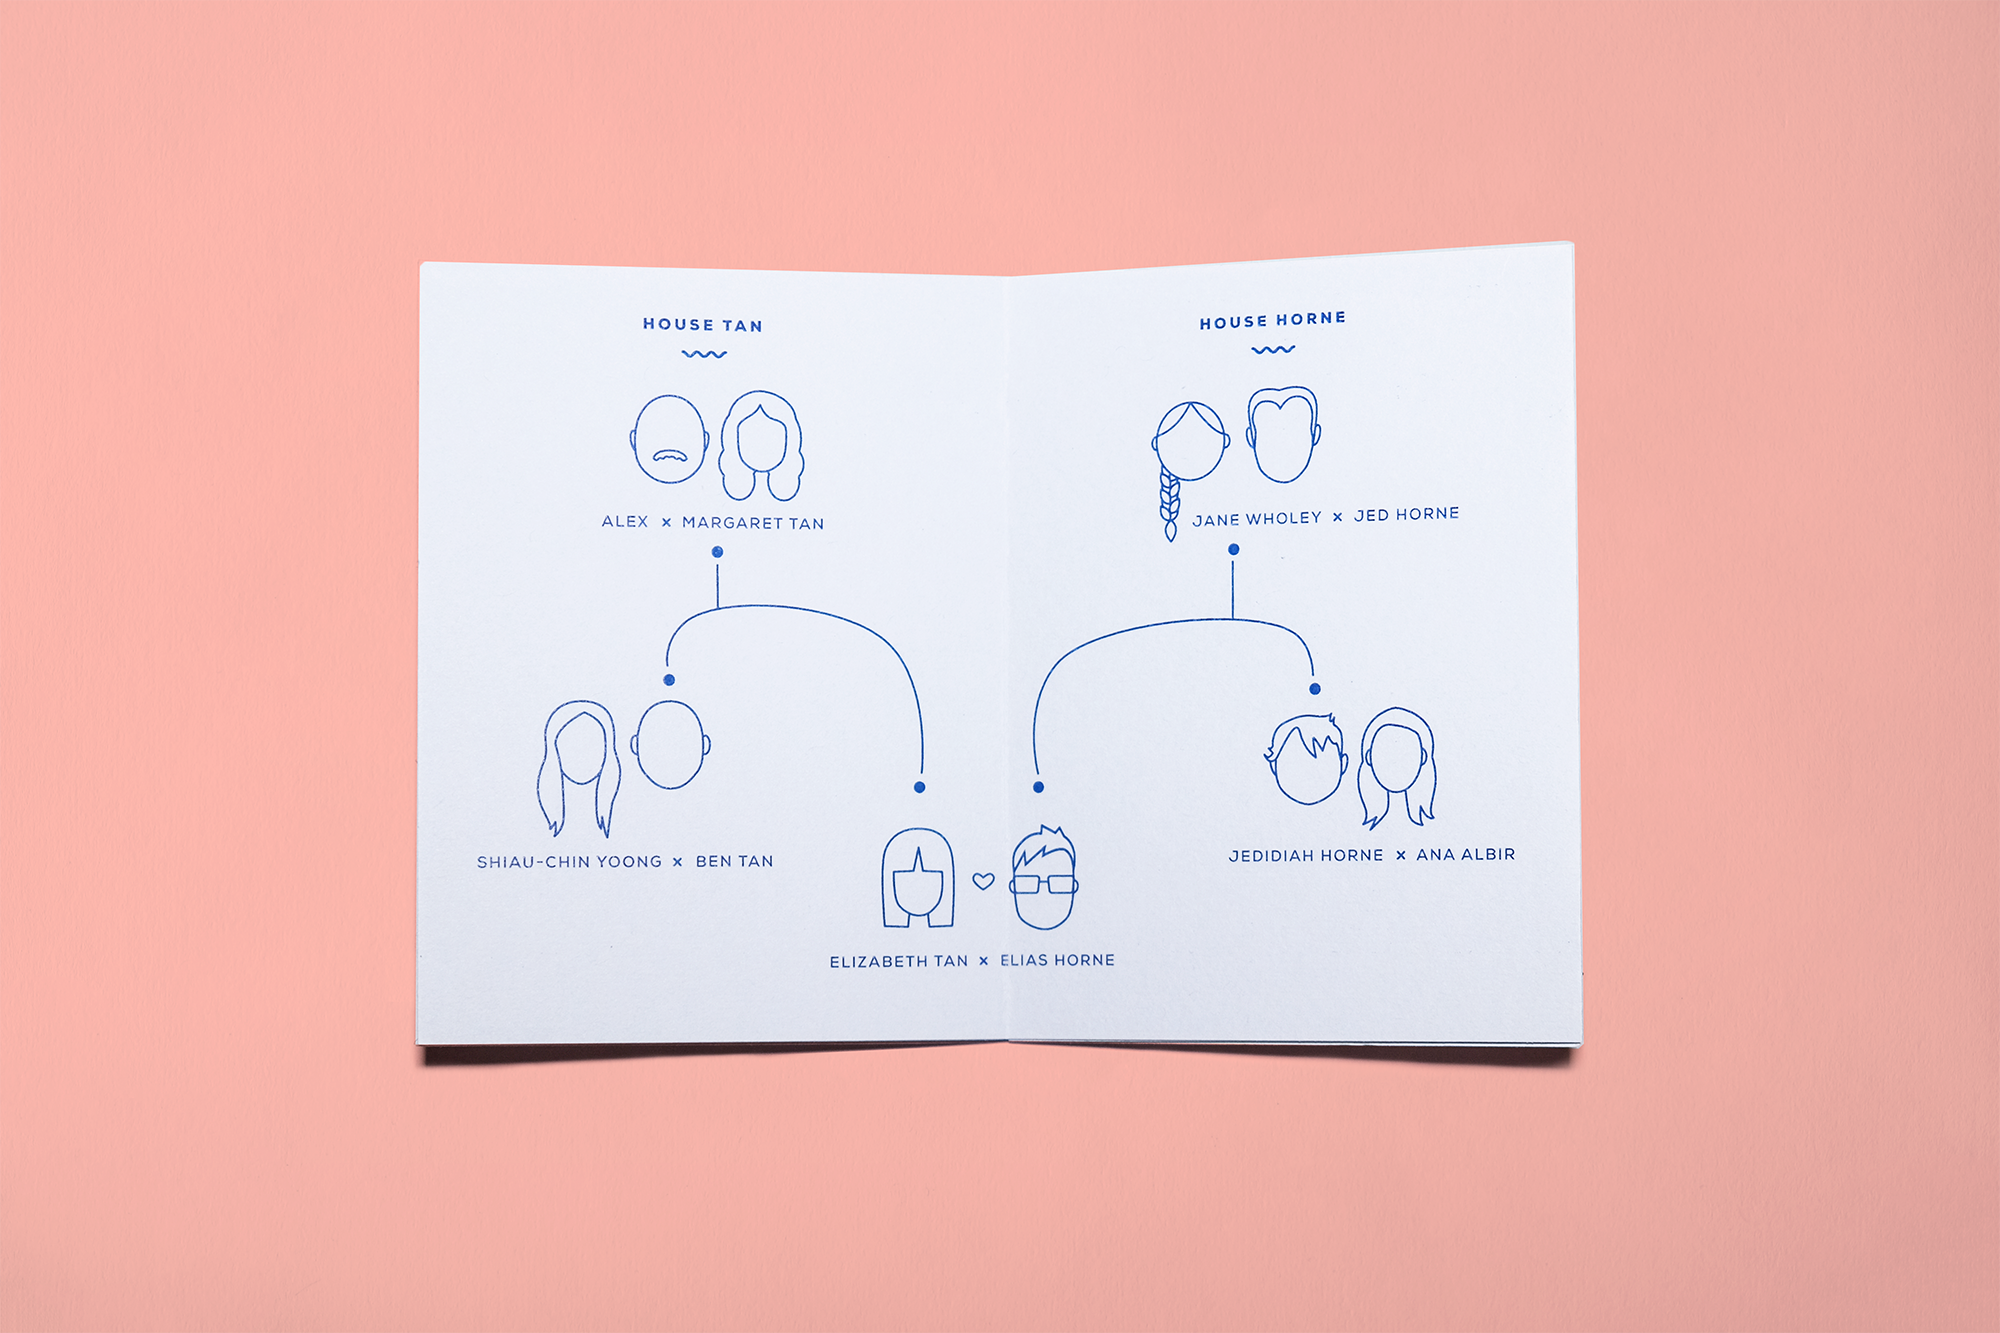 Illustrated family tree.